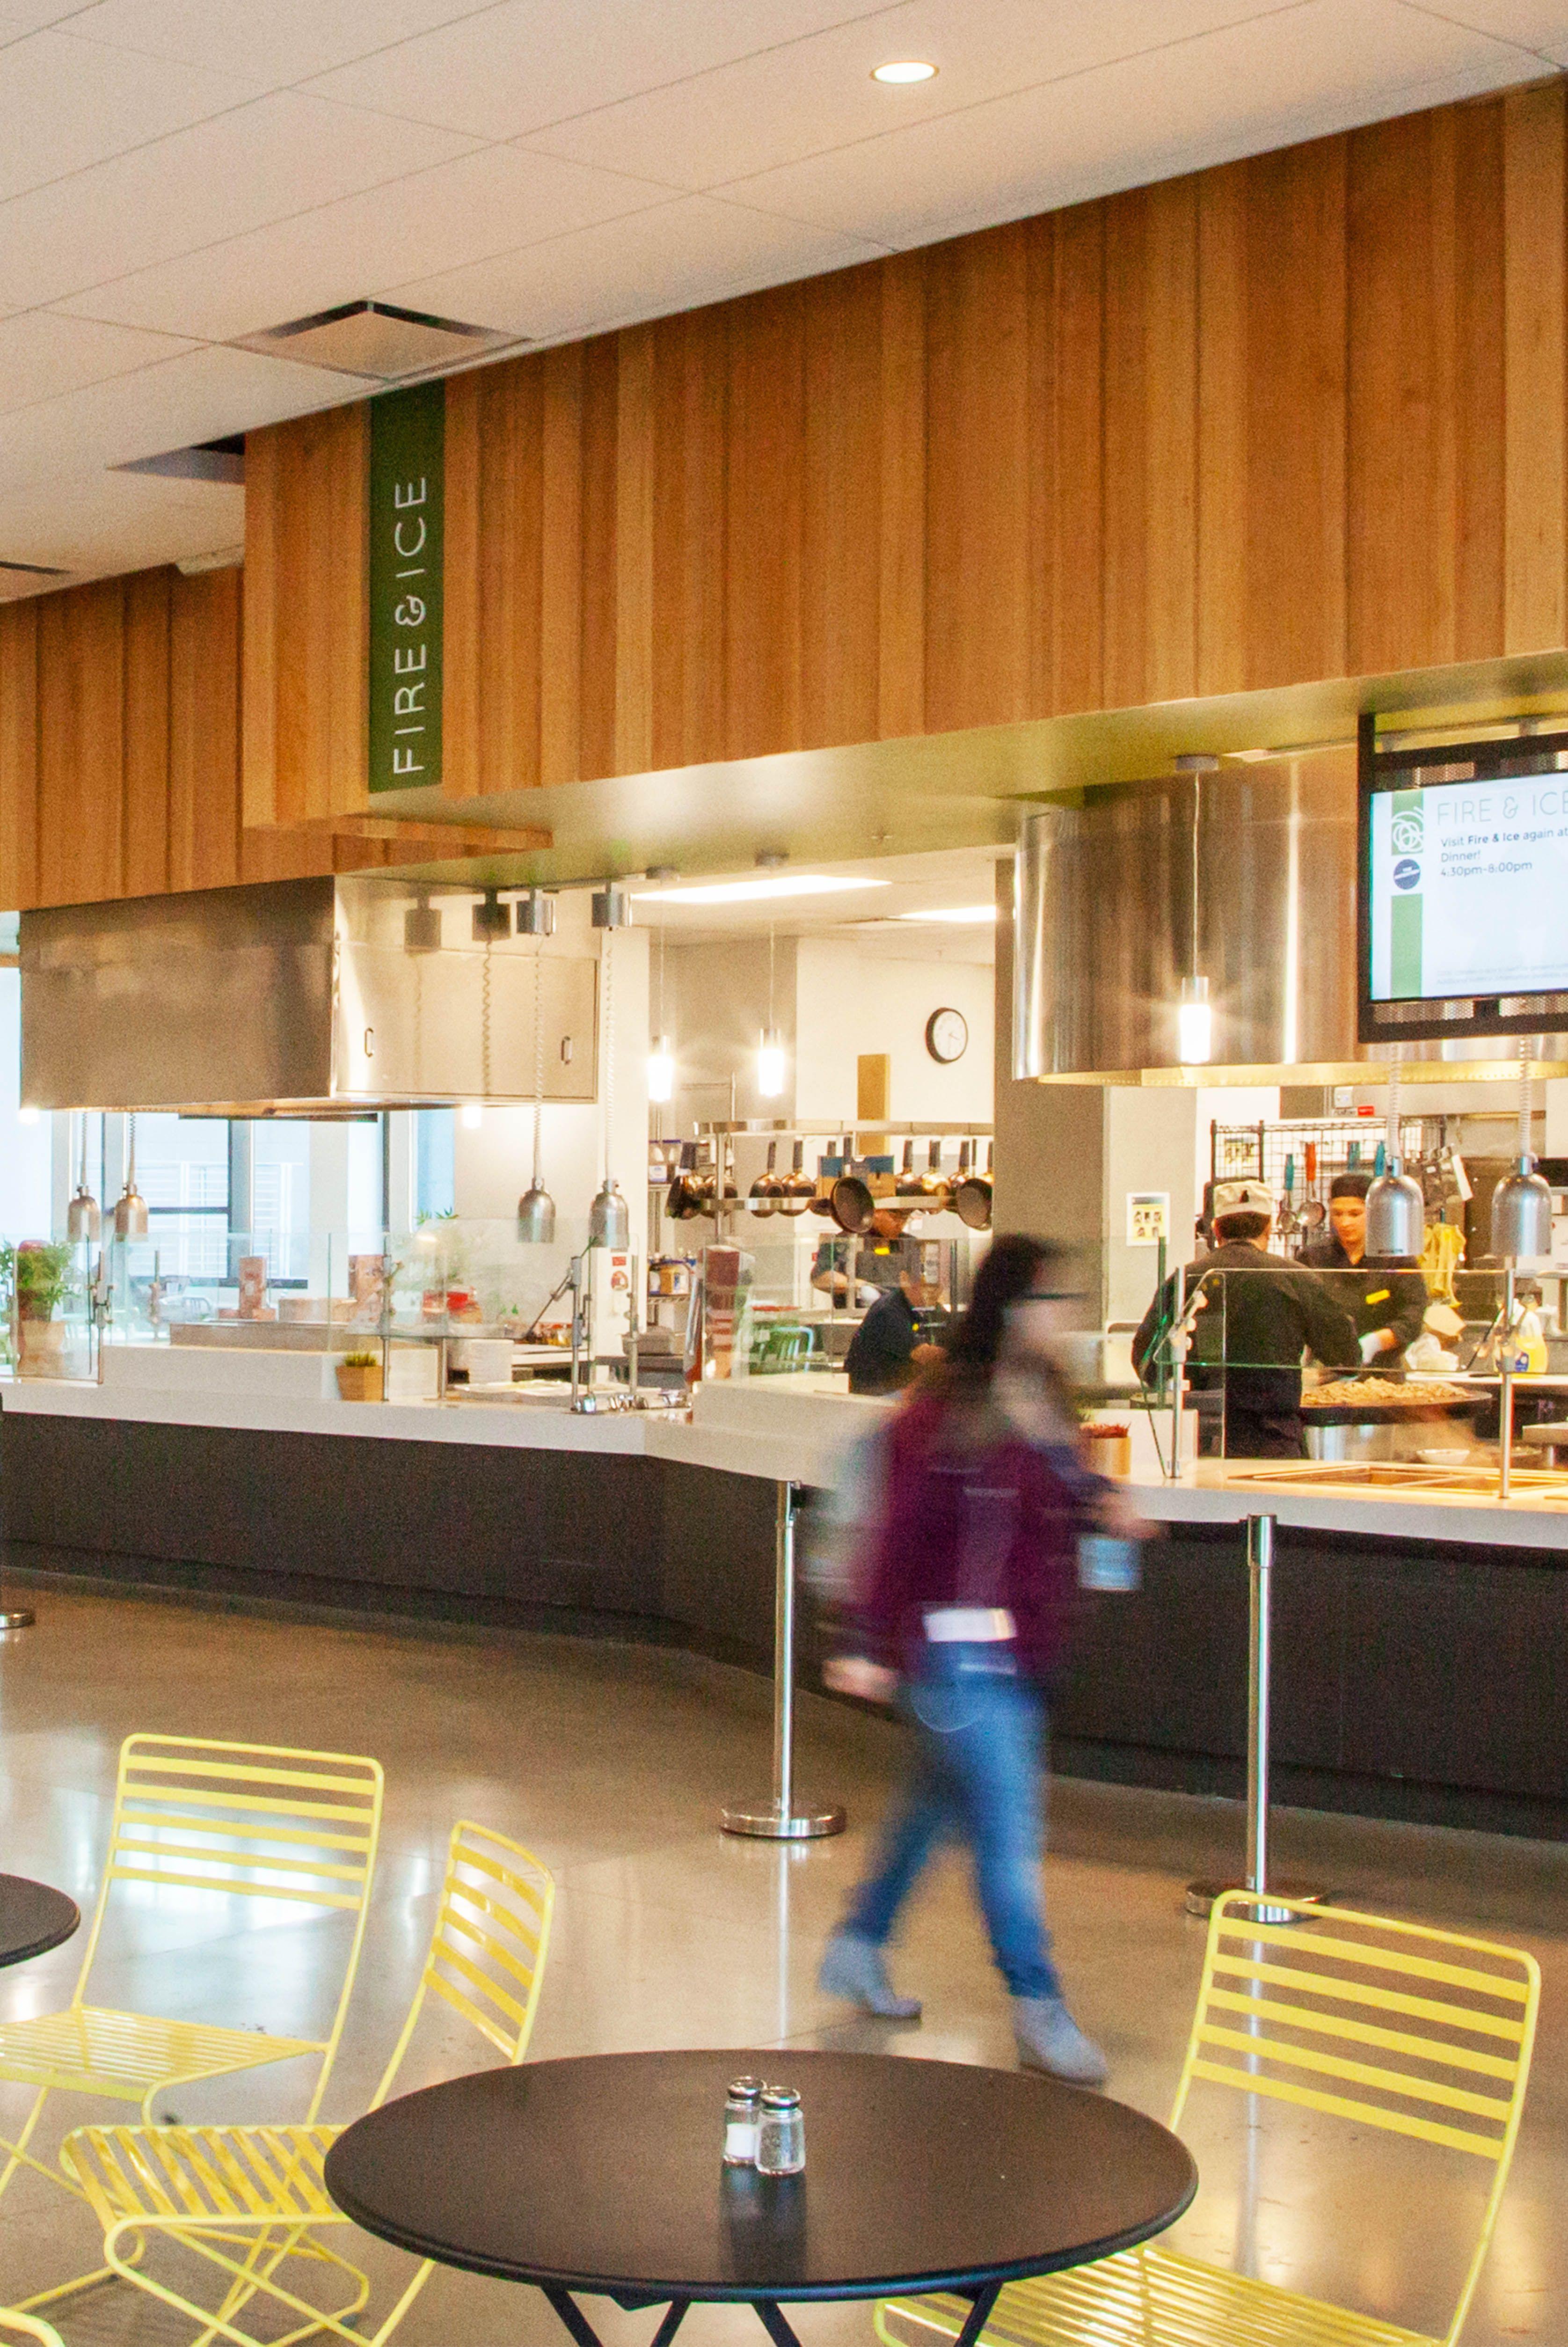 Environmental Graphic Design And Wayfinding For Uc Irvine Irvine California Campus Design Hall Interior Design Food Court Design